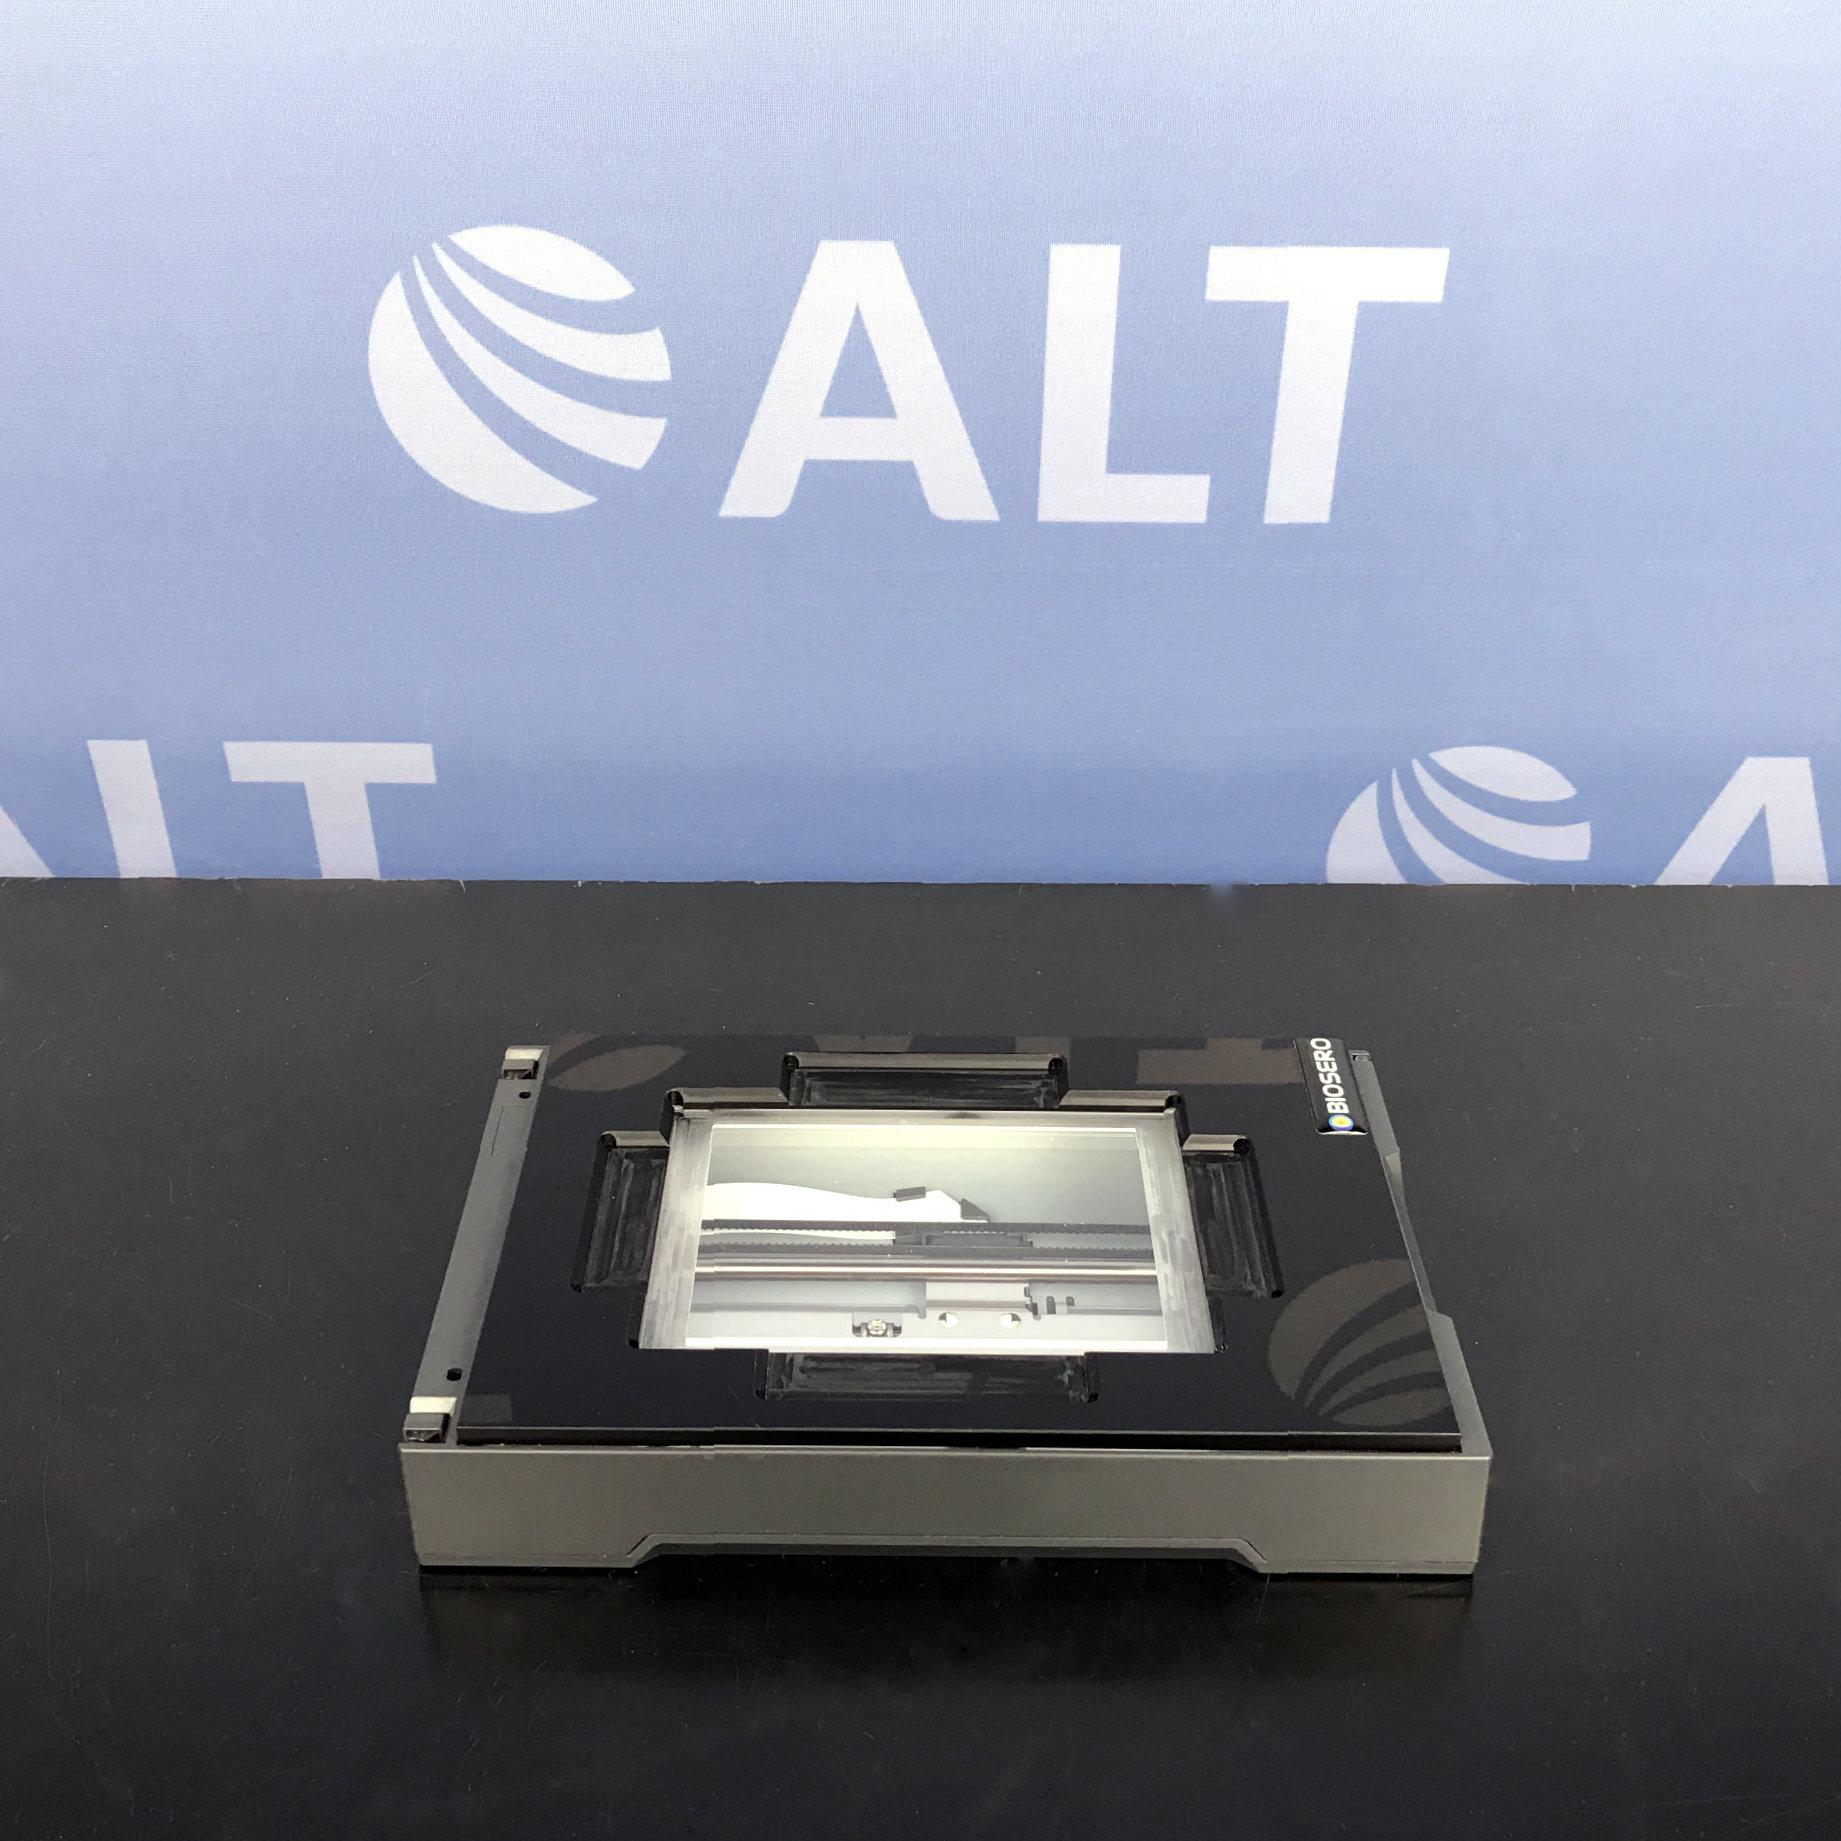 Ziath ZTS-A6-80 DataPaq High Speed Single Rack Scanner  Name